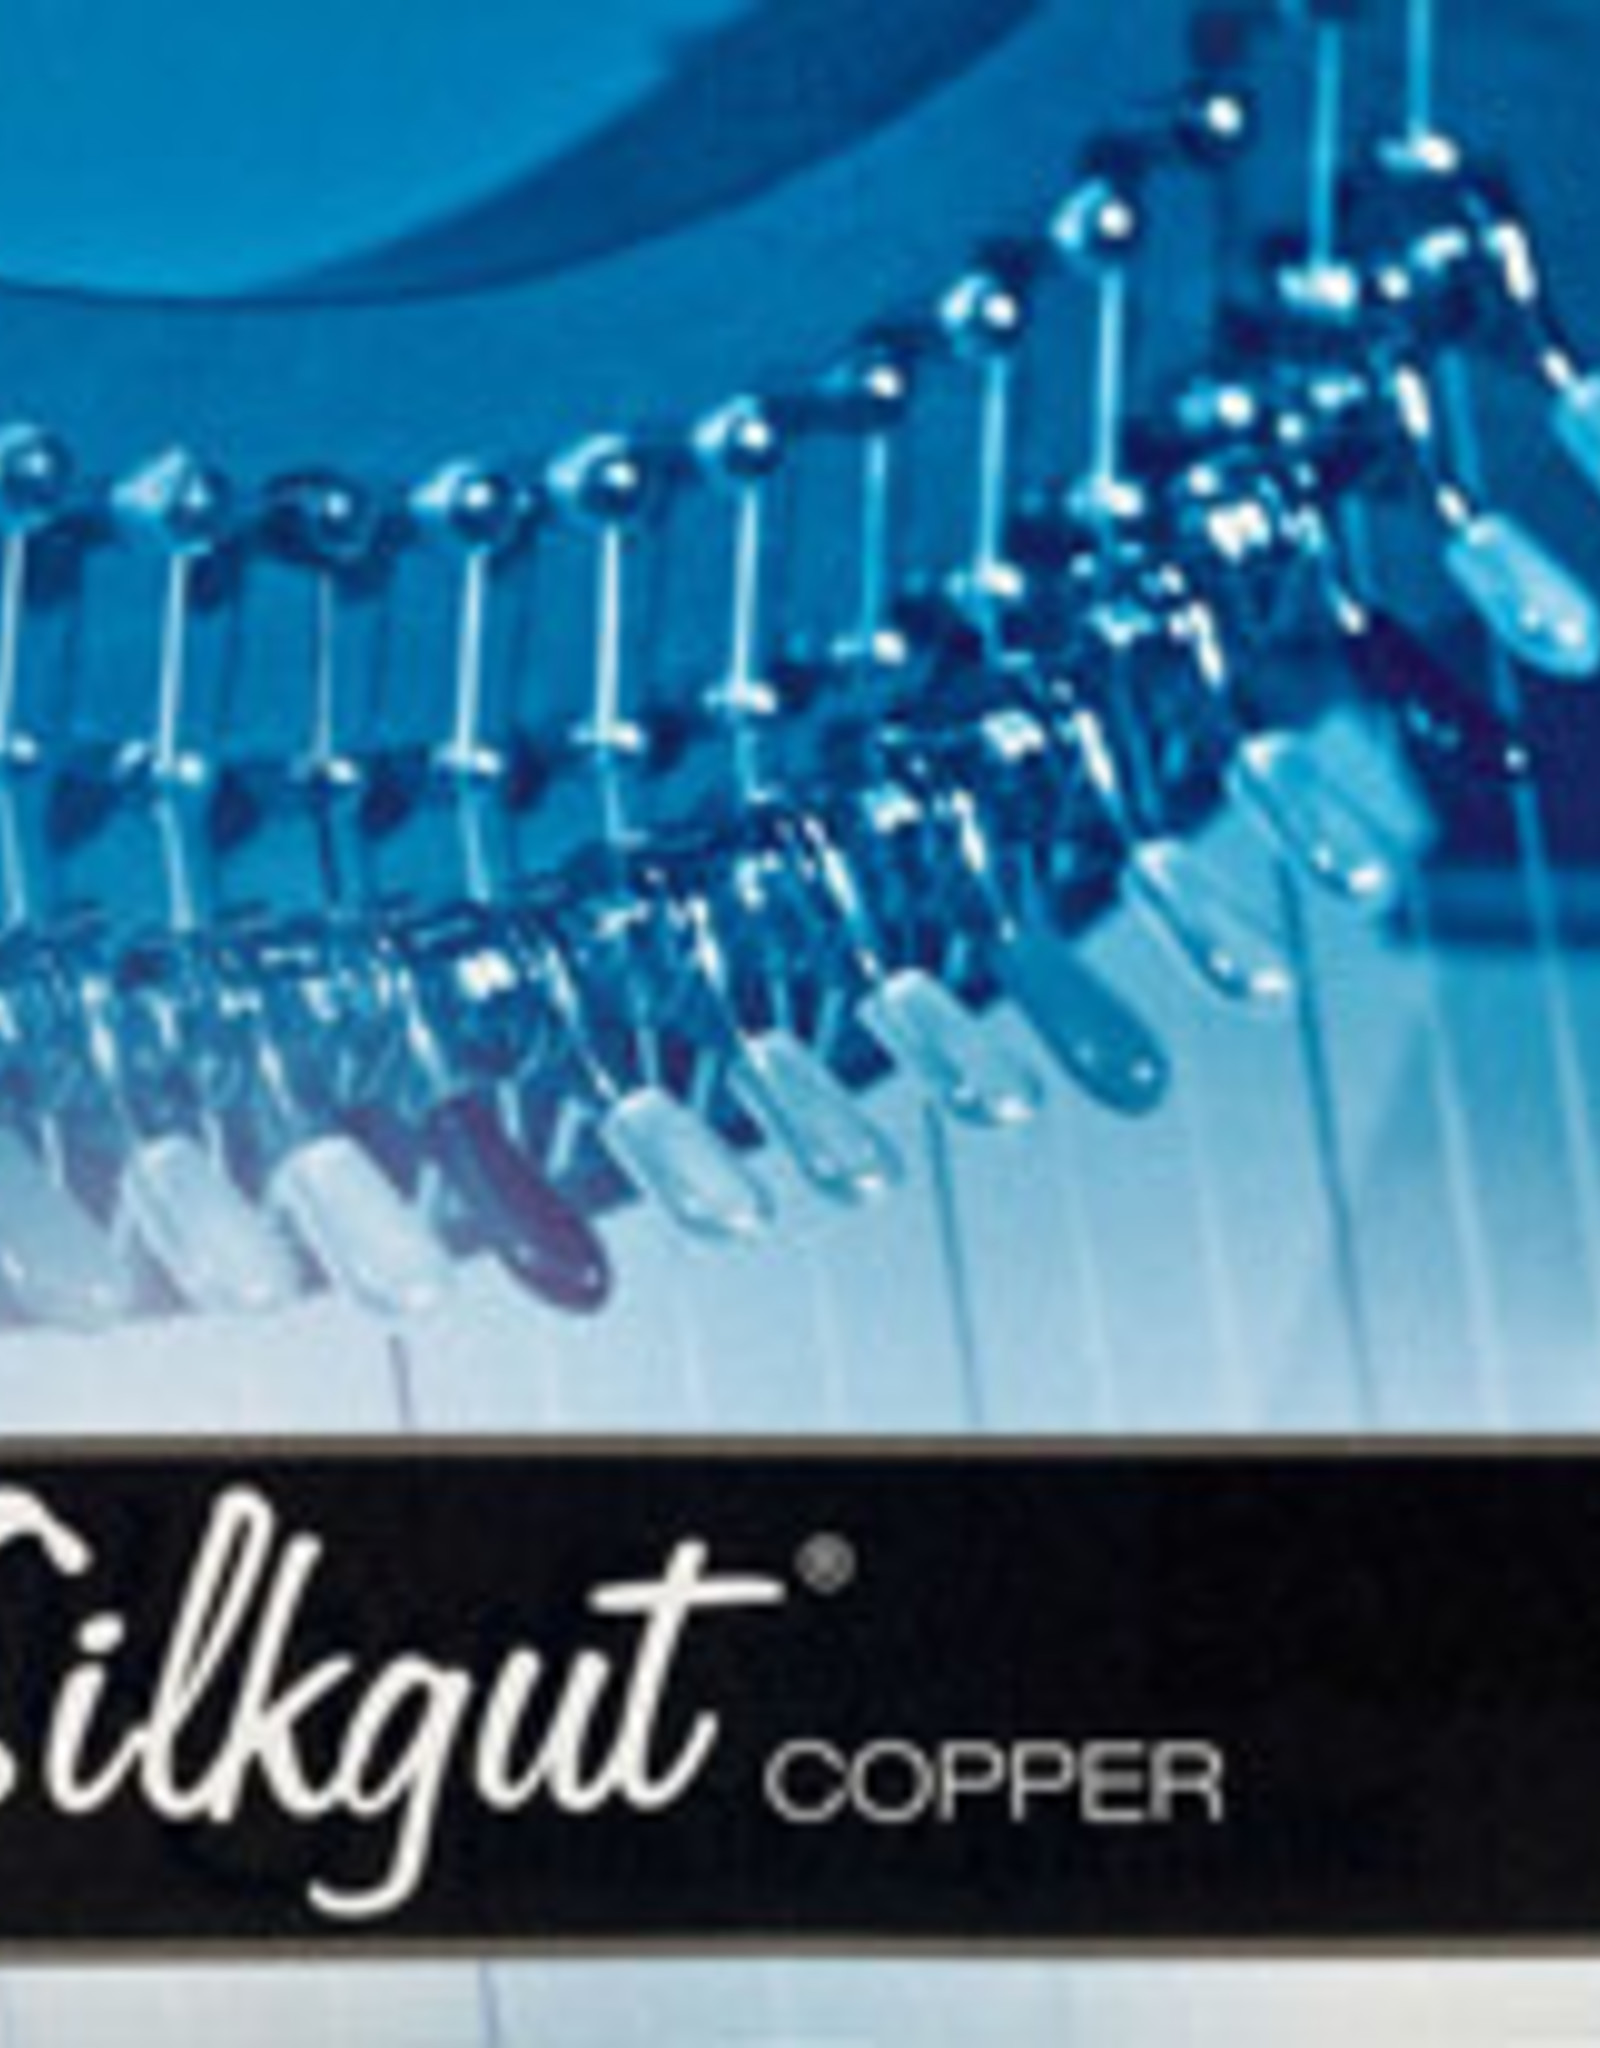 BOW BRAND silkgut copper 29/5MI